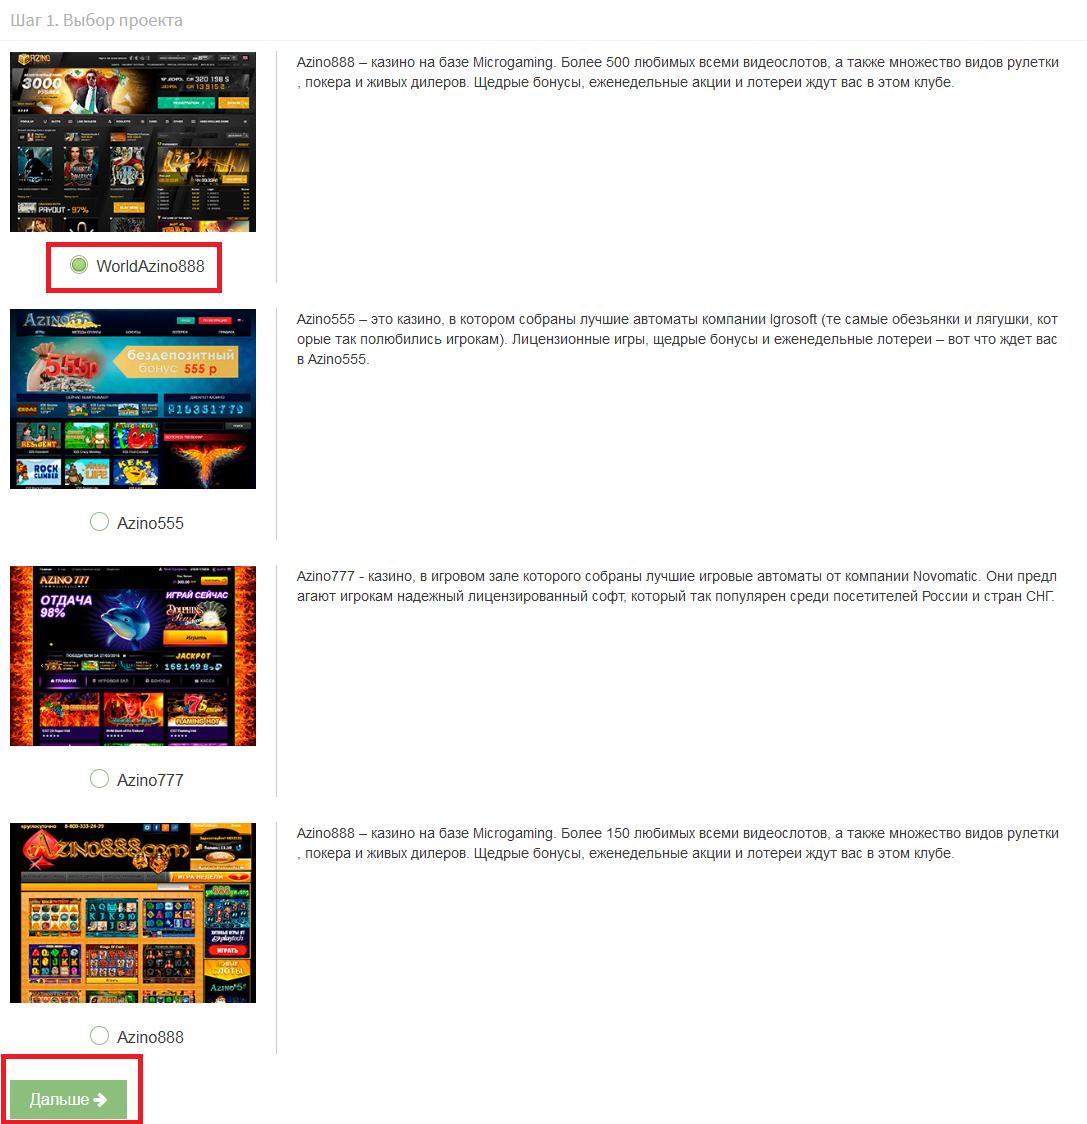 azino888 www бонус за регистрацию онлайн казино